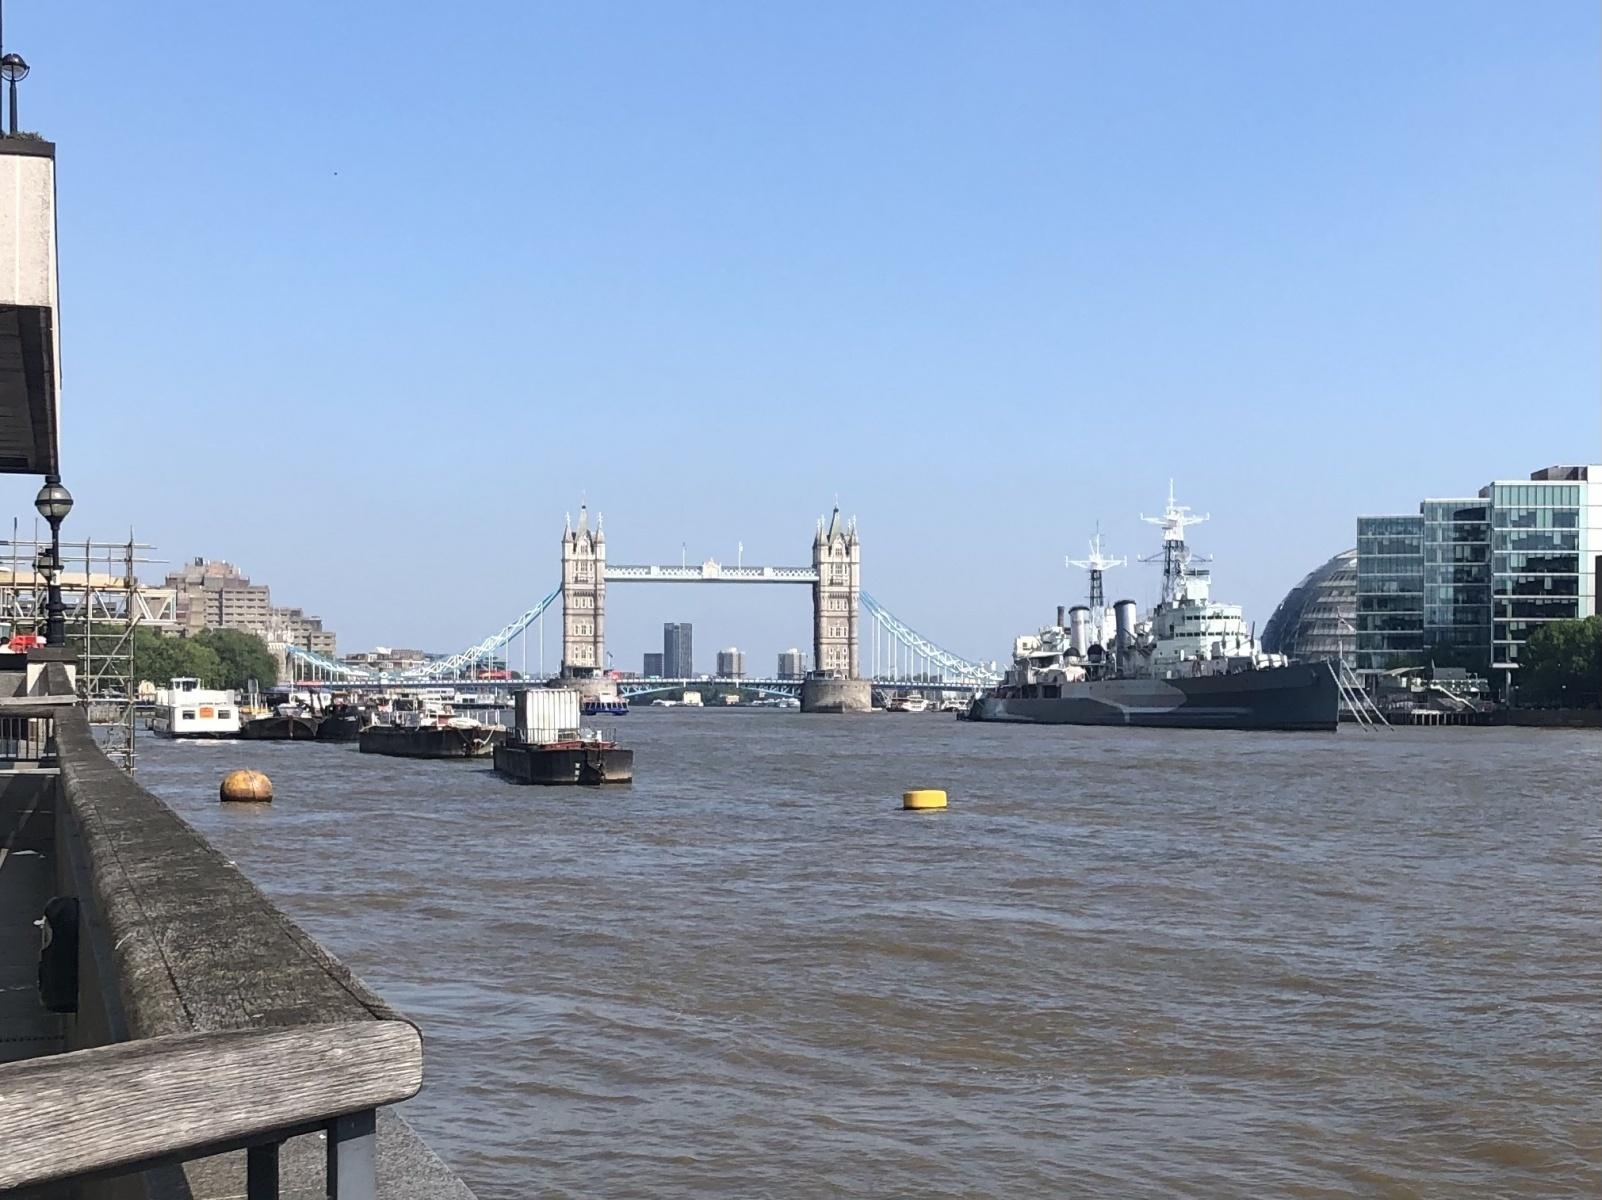 Tower-Bridge-HMS-Belfast